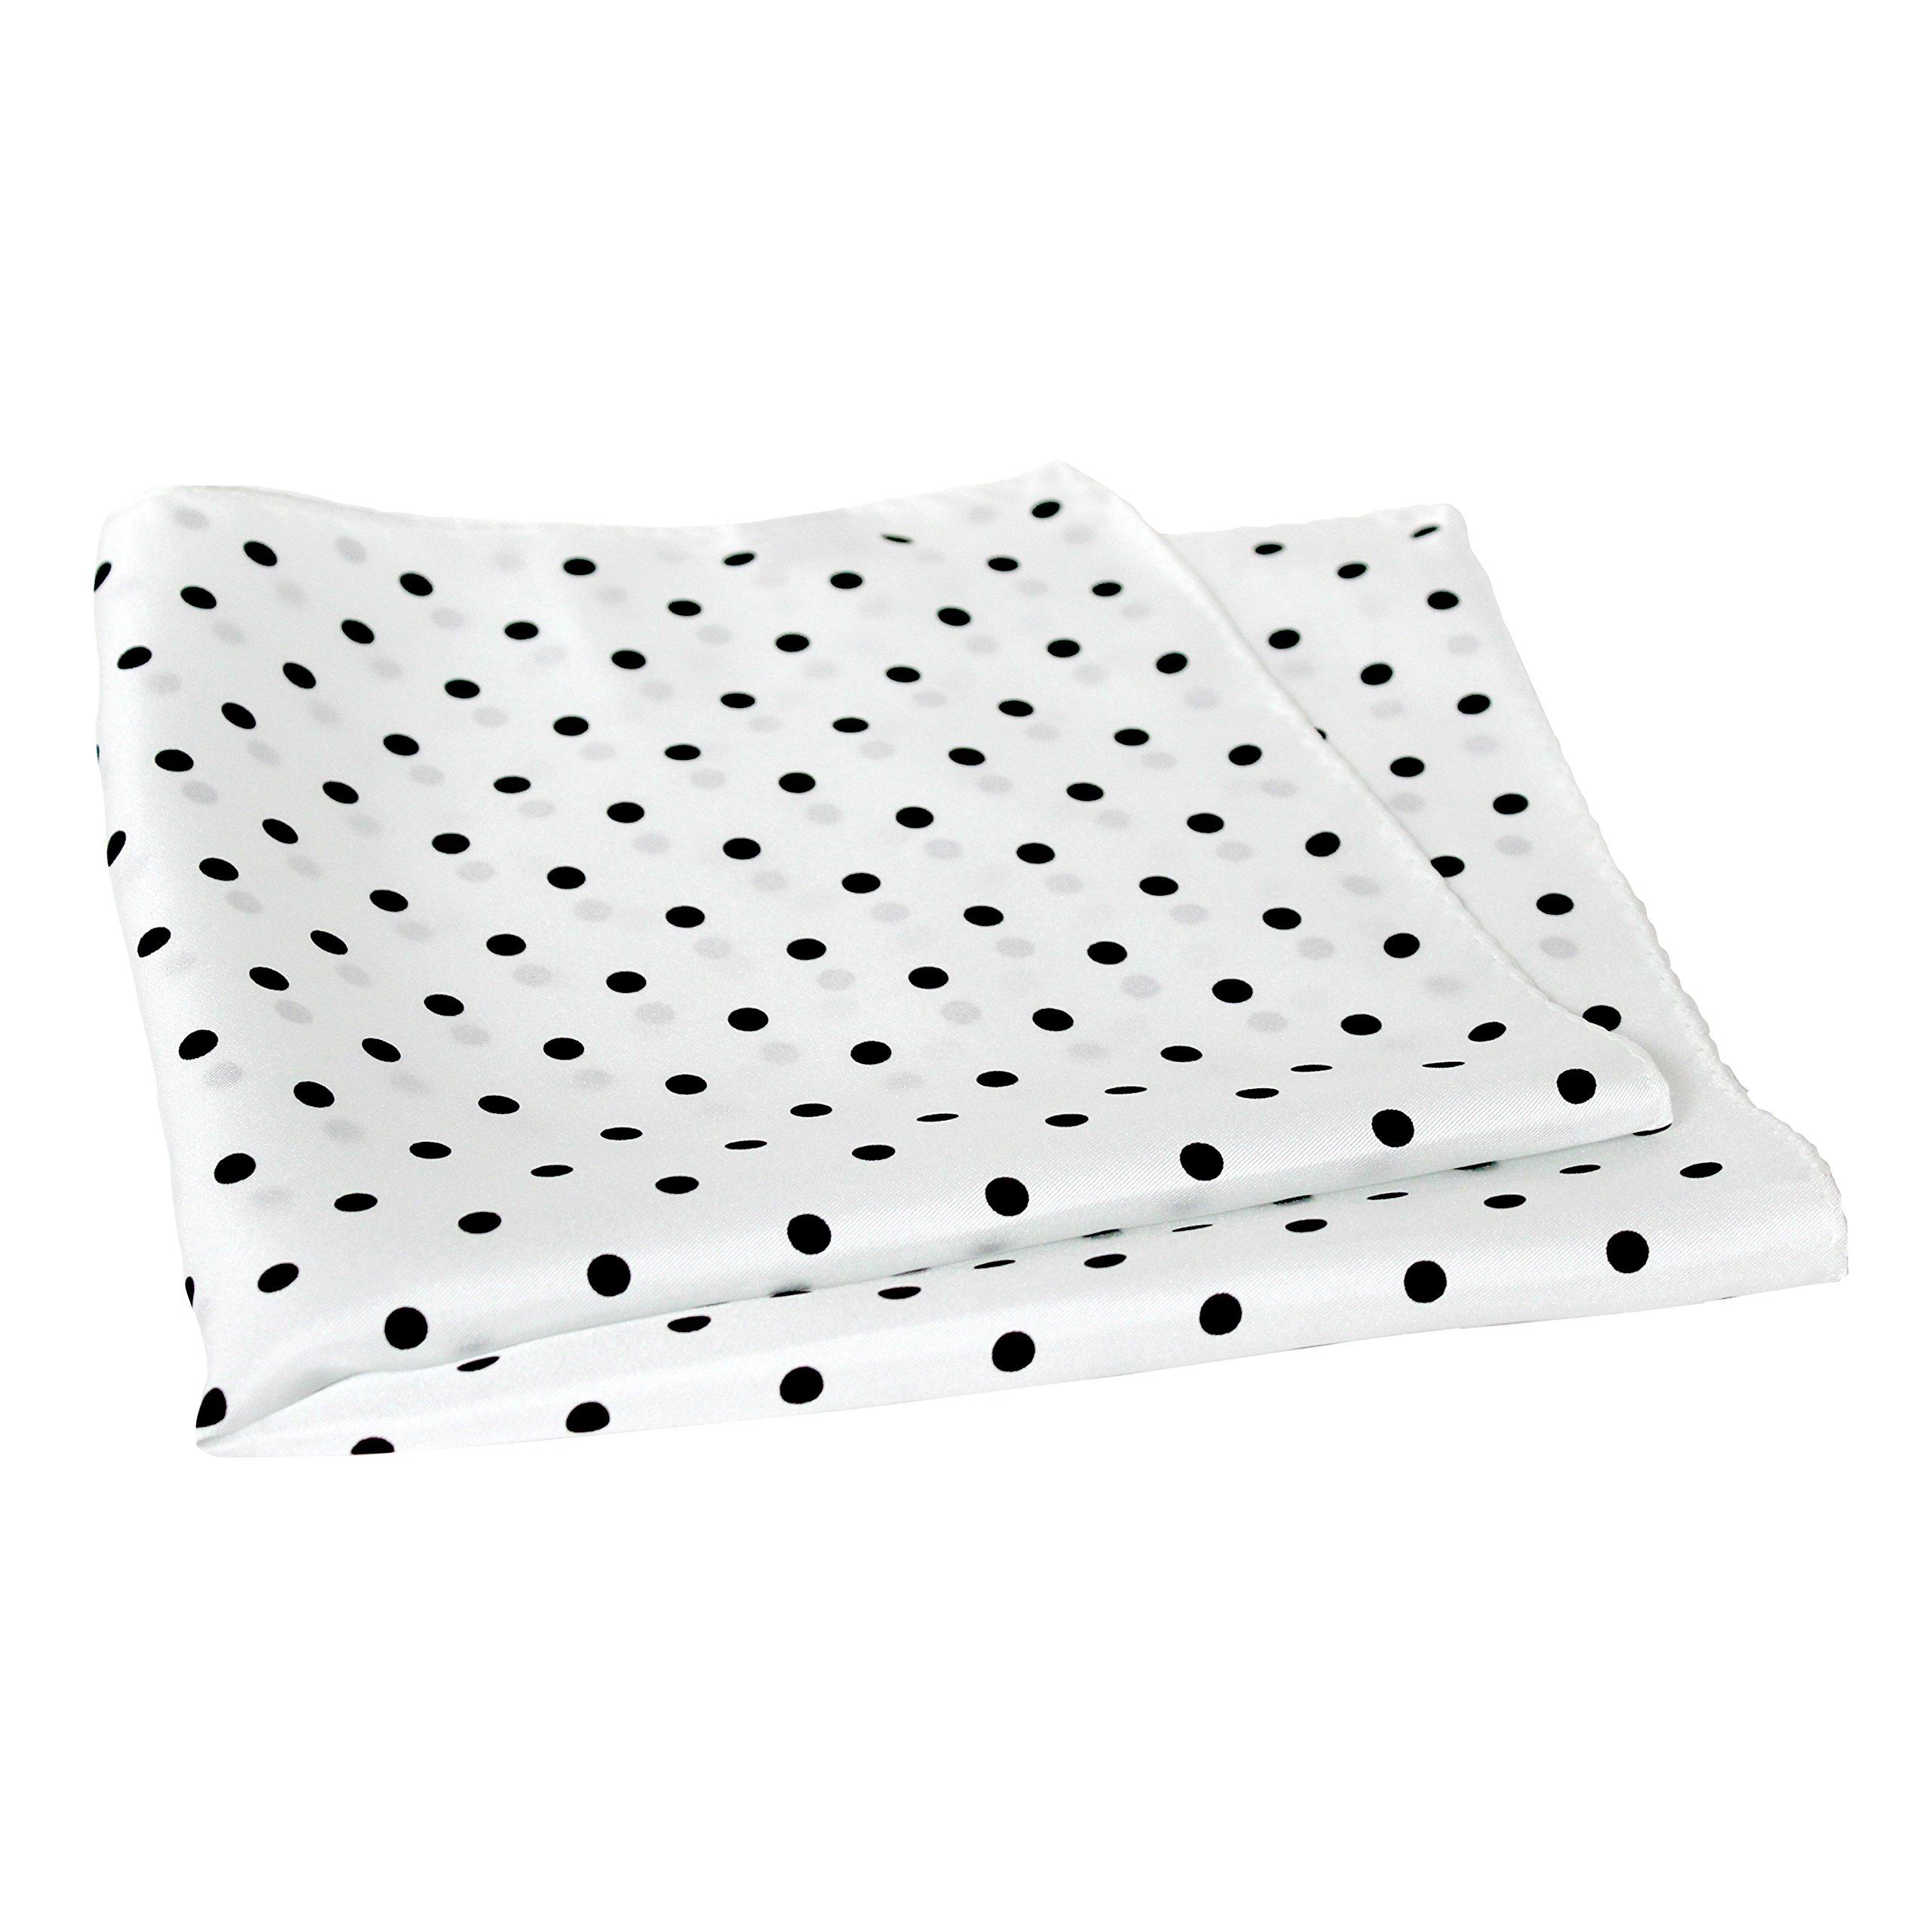 White Silk Polka Dot Pocket Square - 17'' Handkerchief - 12mm Silk Twill